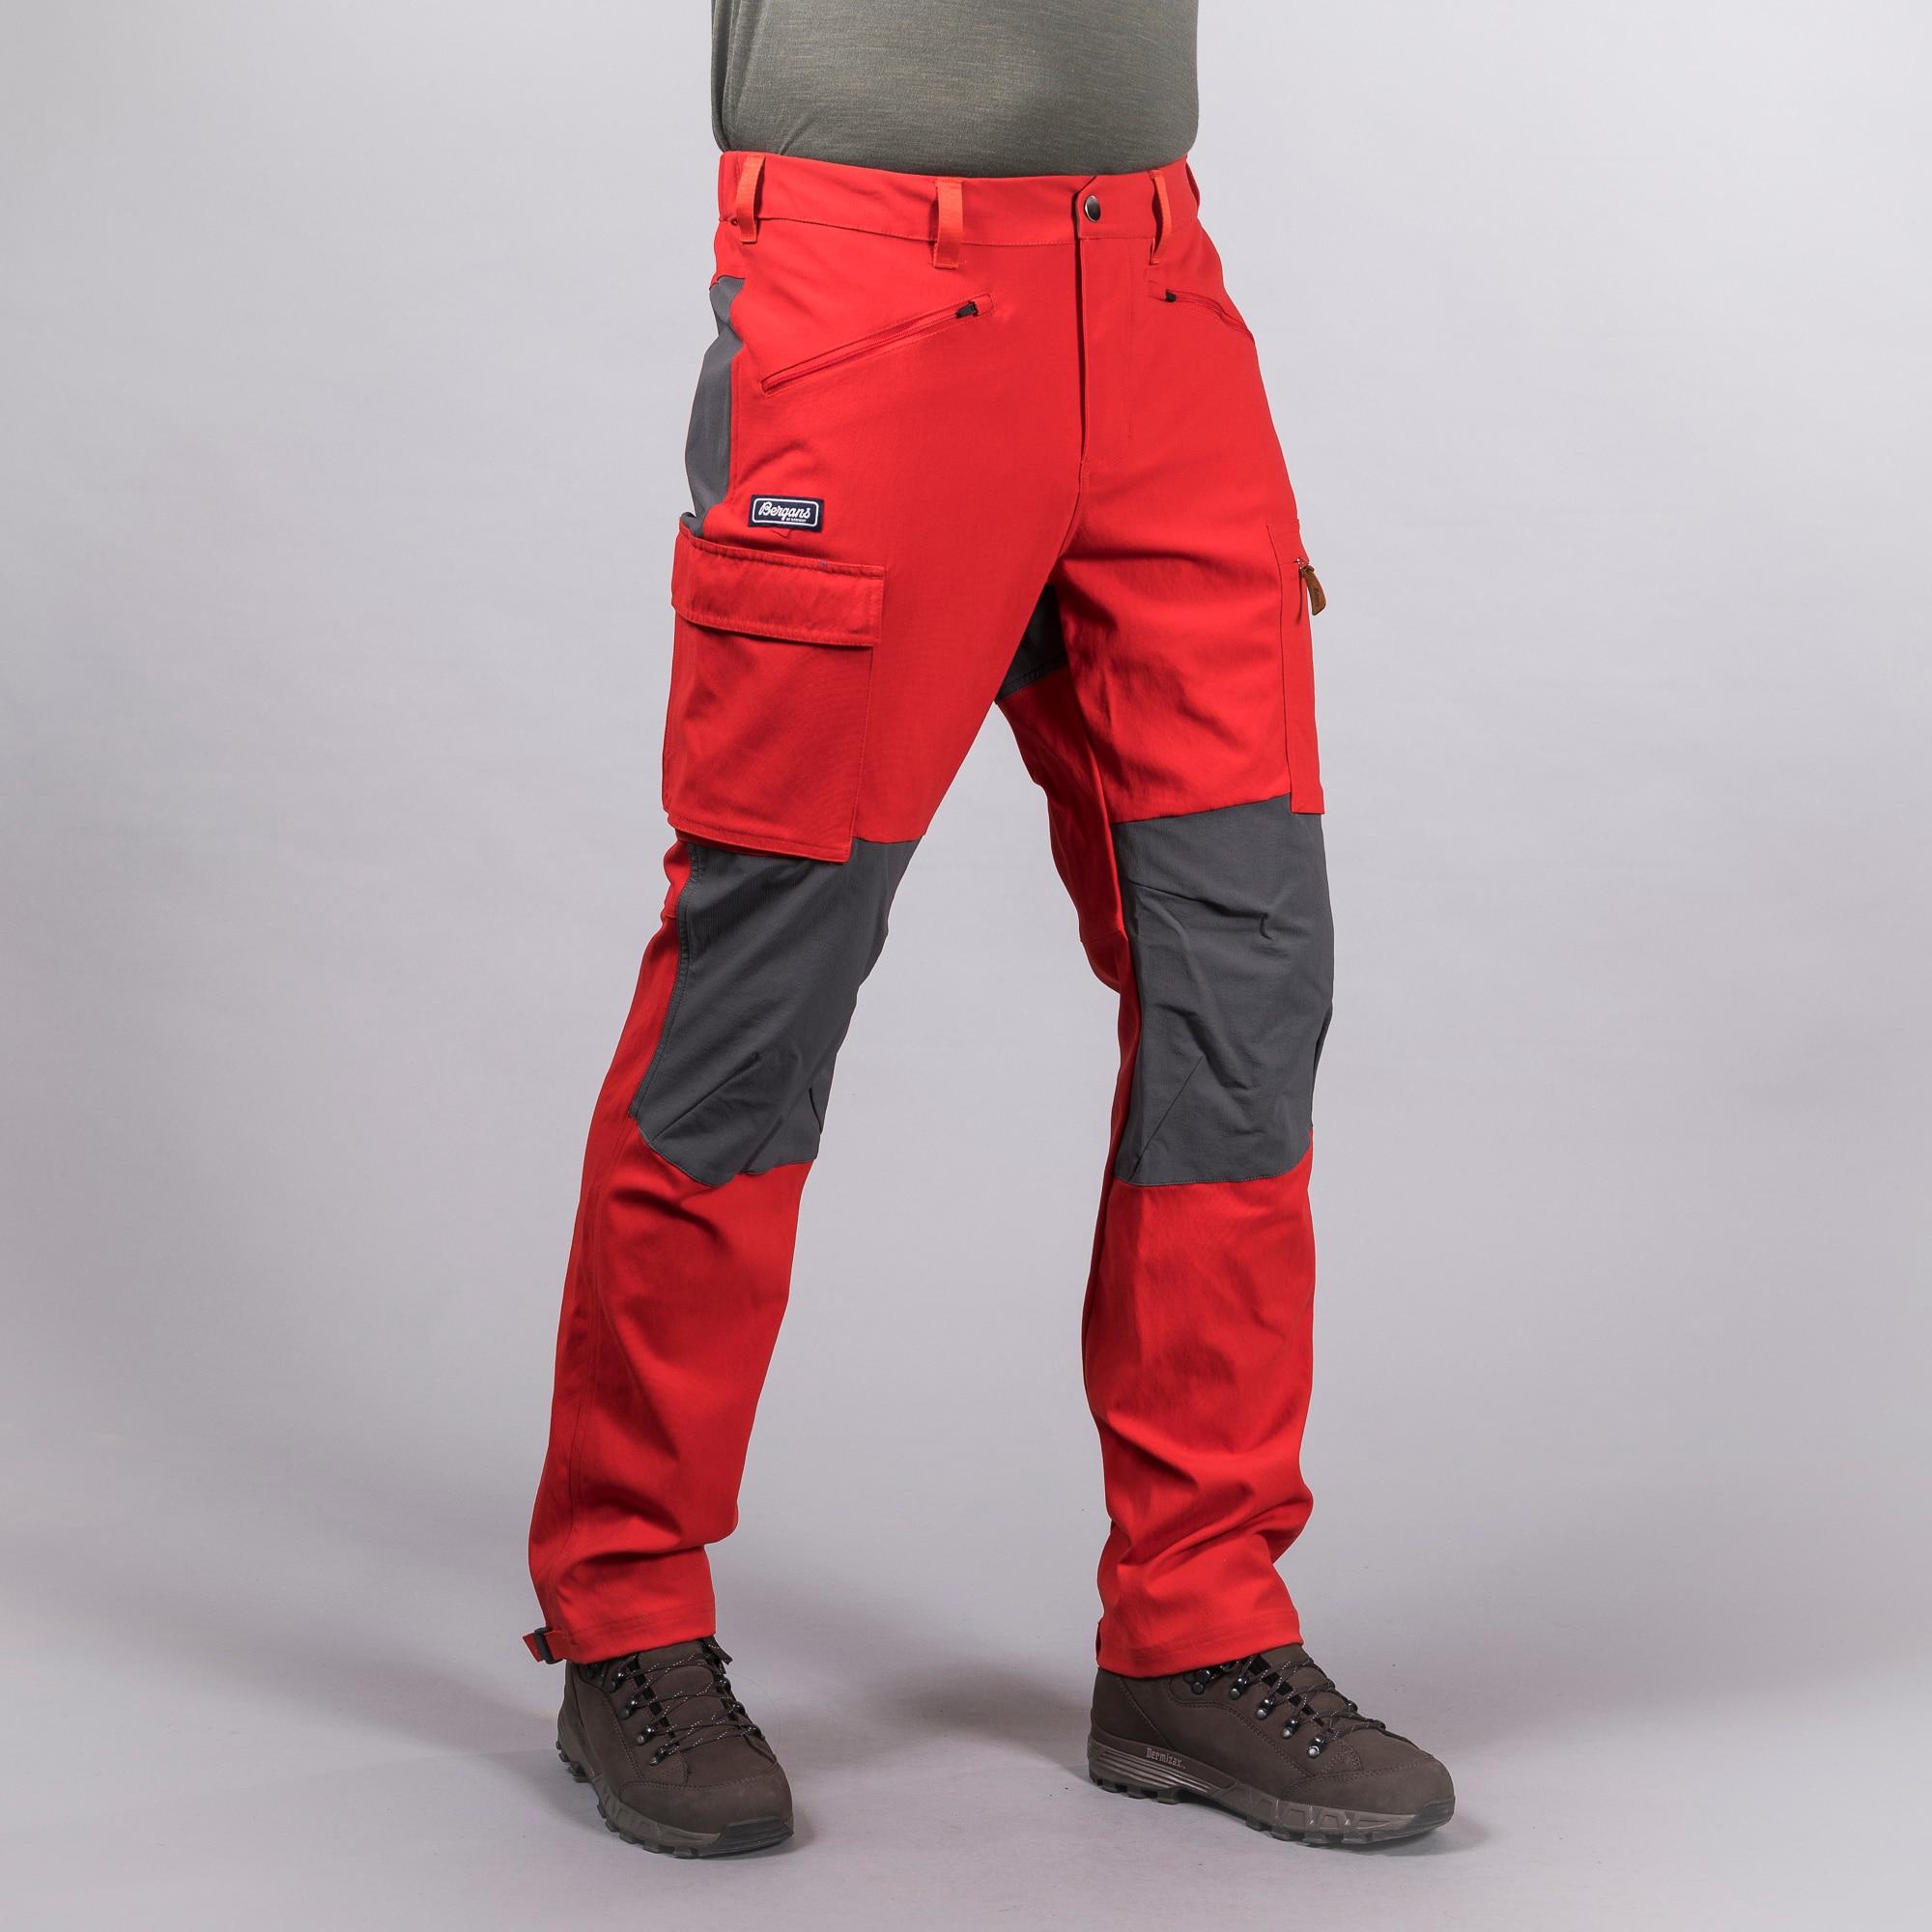 Nordmarka Hybrid Pants